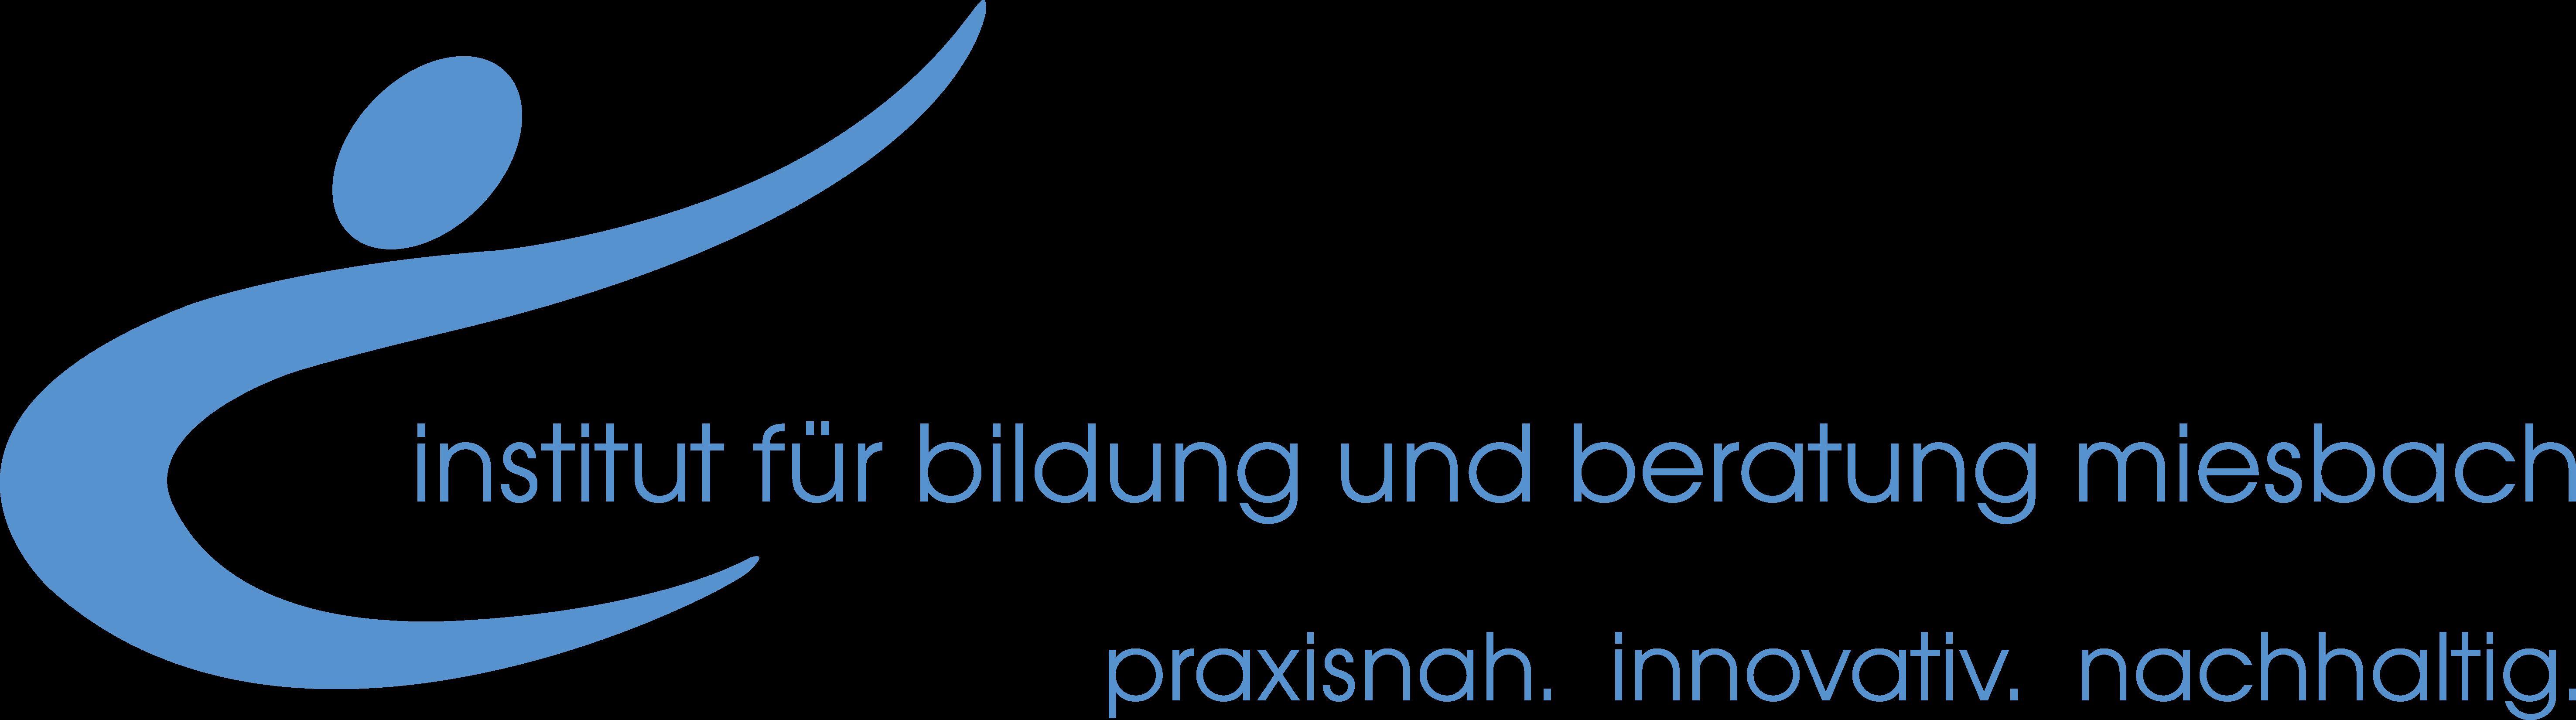 IBB Miesbach – Institut für Bildung & Beratung Miesbach